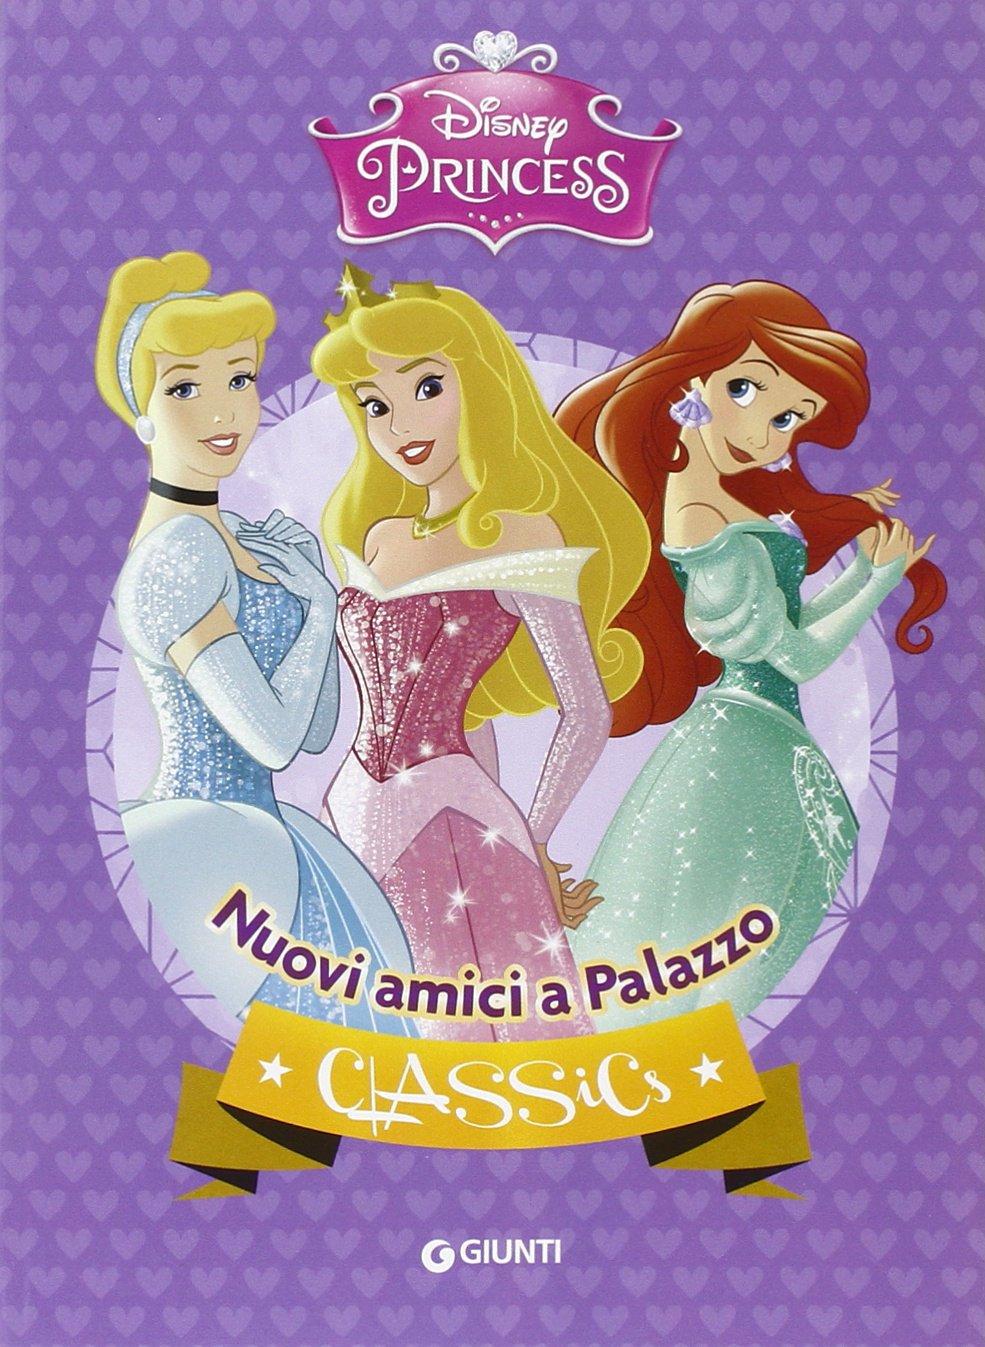 Princess, Nuovi amici al Palazzo